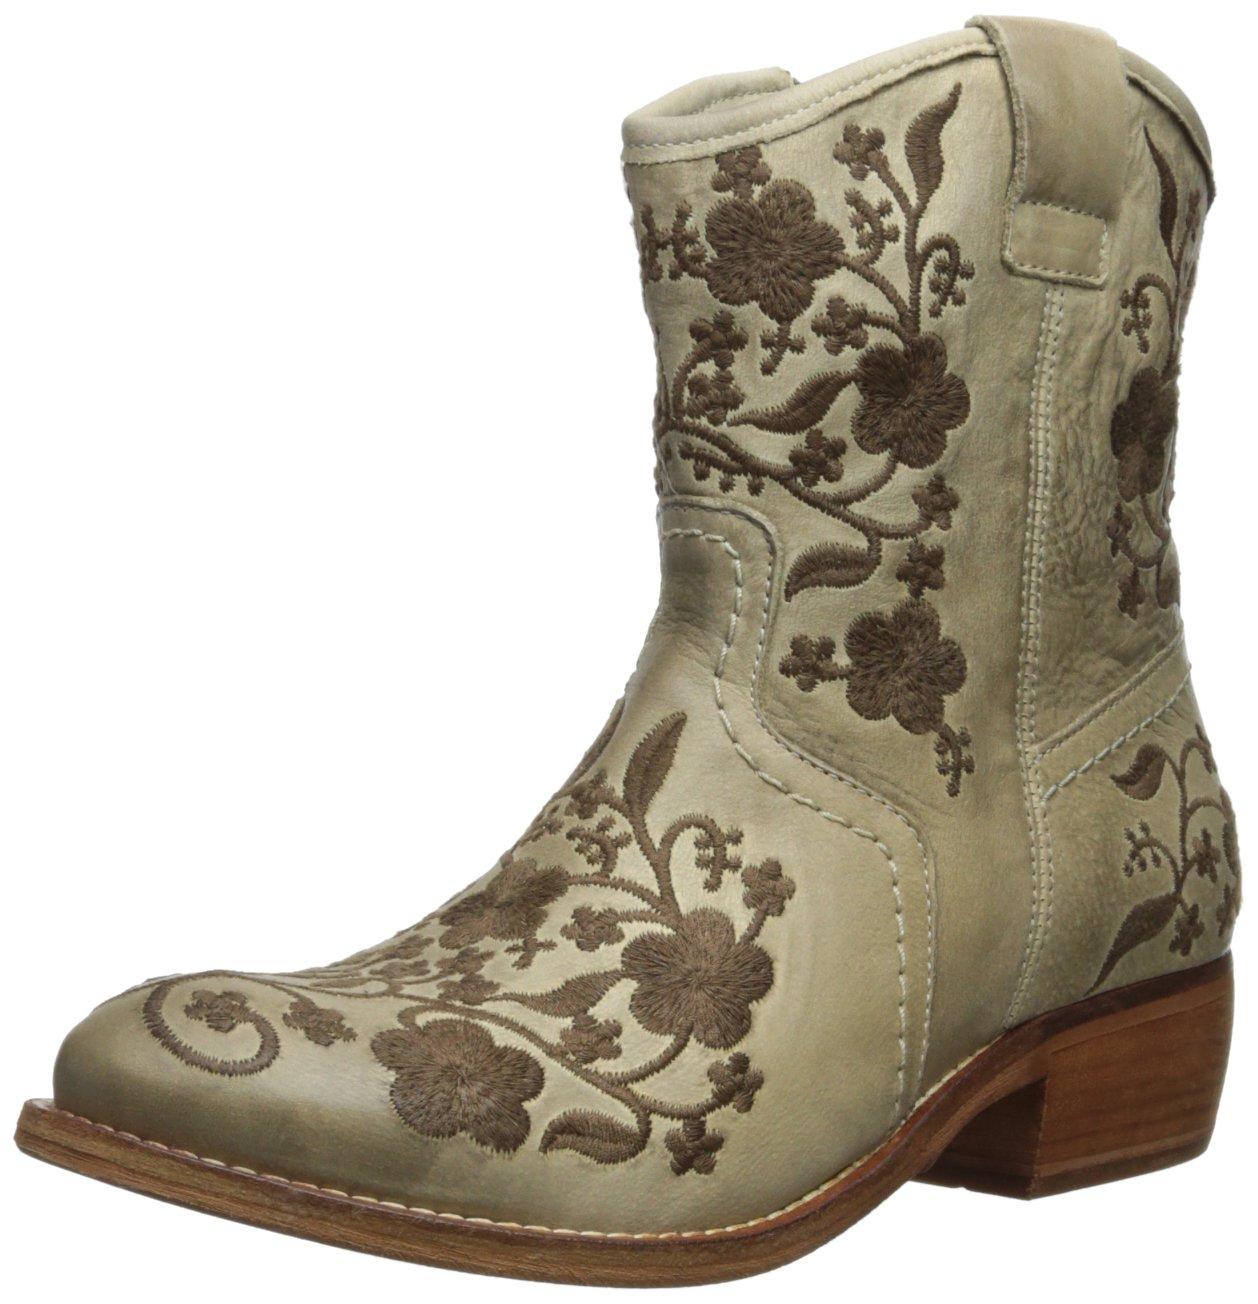 Taos Women's Privilege Western Boot B00IPO9ZG8 39 EU/8-8.5 M US|Stone